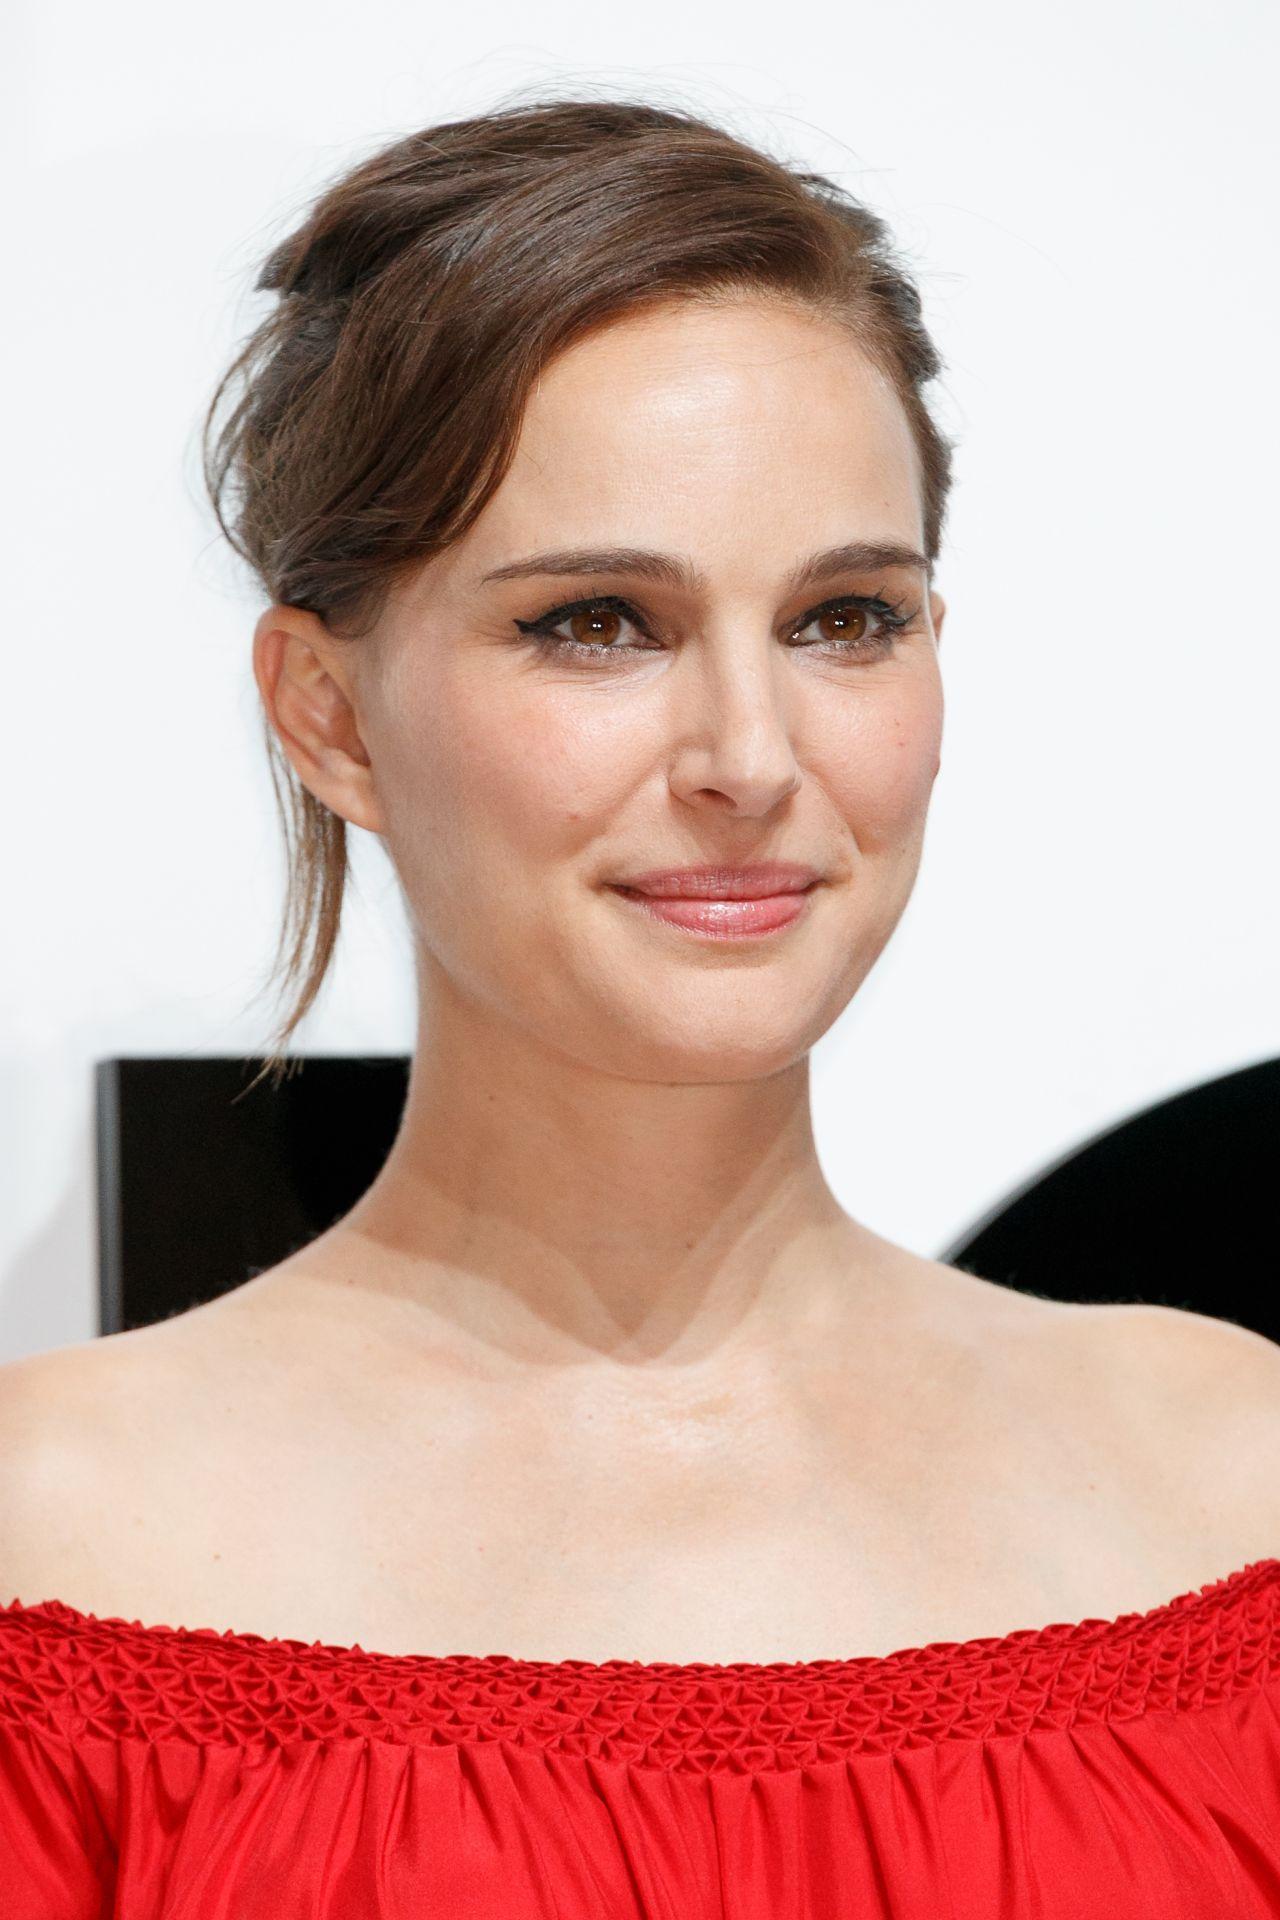 Natalie Portman - Dior for Love' Event at Terrada ...